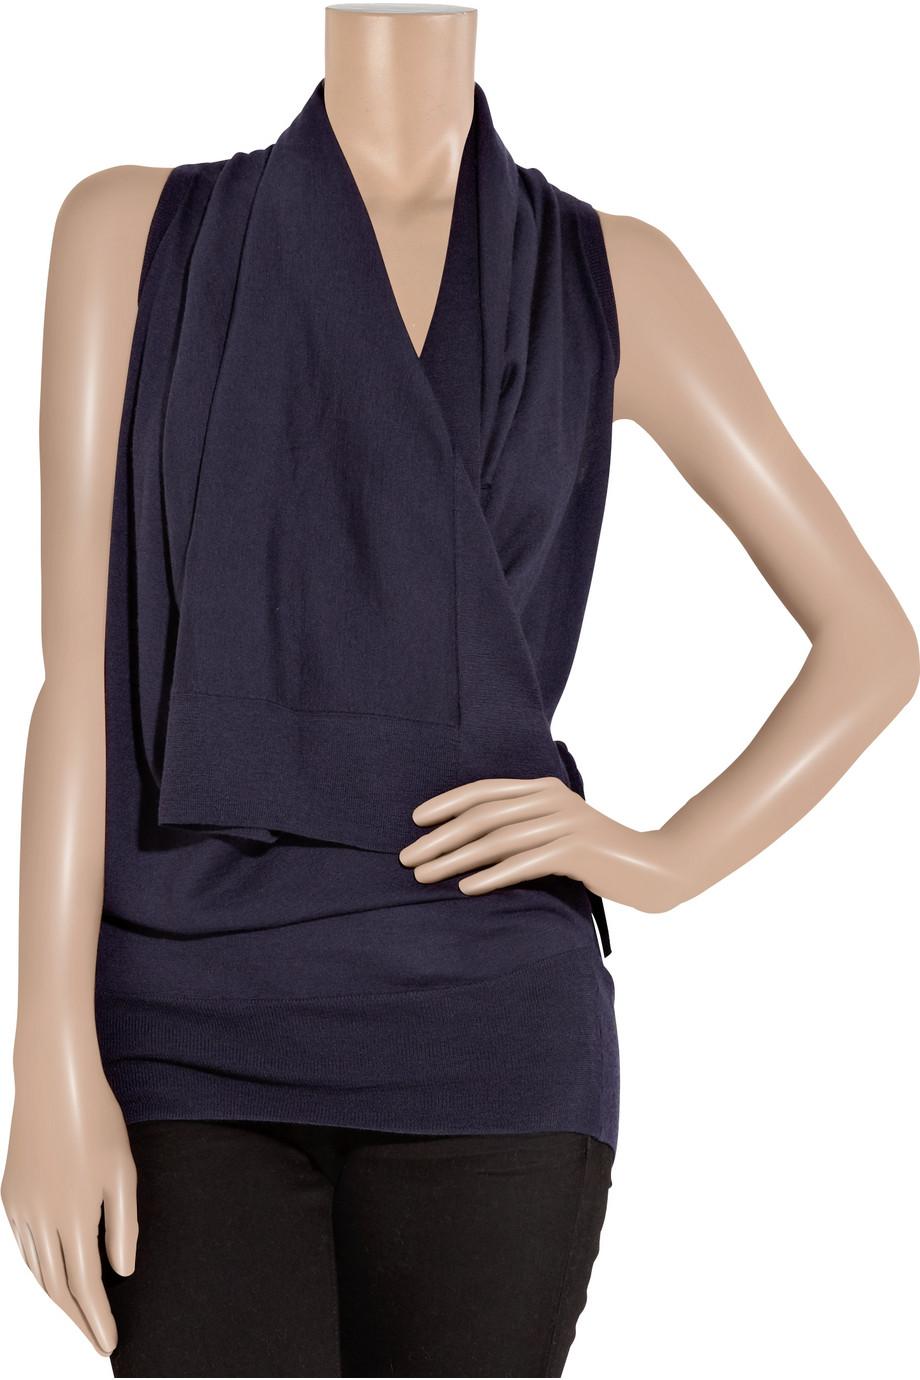 lyst donna karan cashmere and silk blend wrap effect top. Black Bedroom Furniture Sets. Home Design Ideas